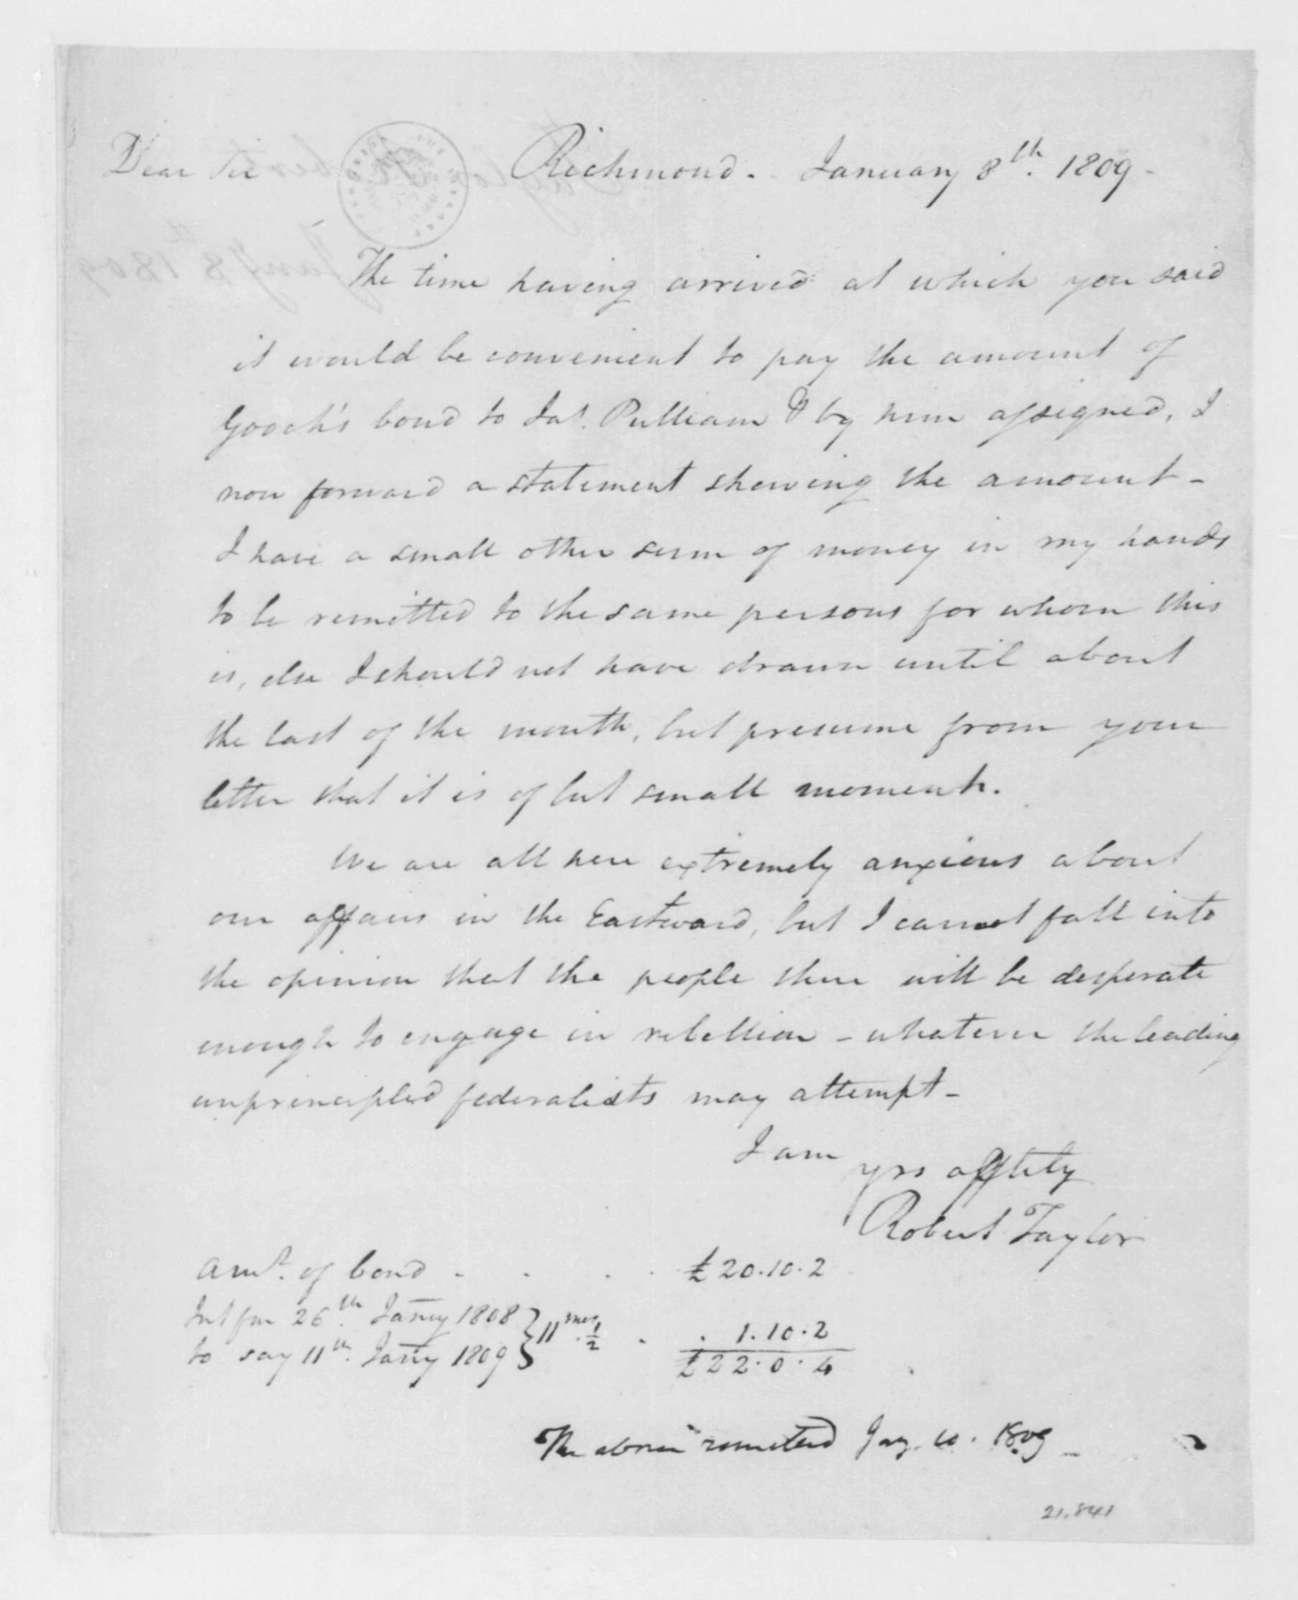 Robert Taylor to James Madison, January 8, 1809.